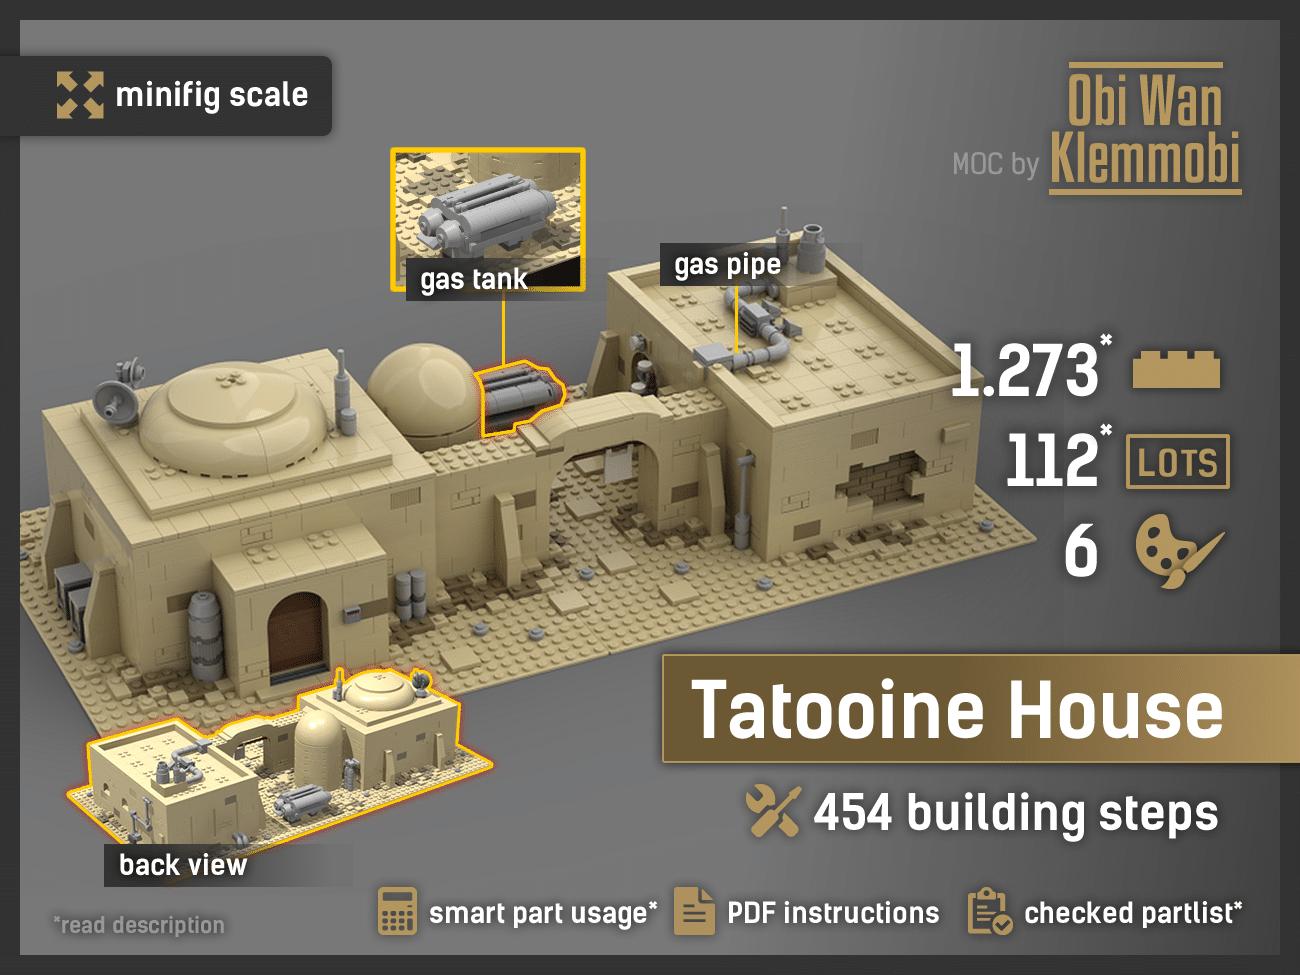 Tatooine Doublehouse